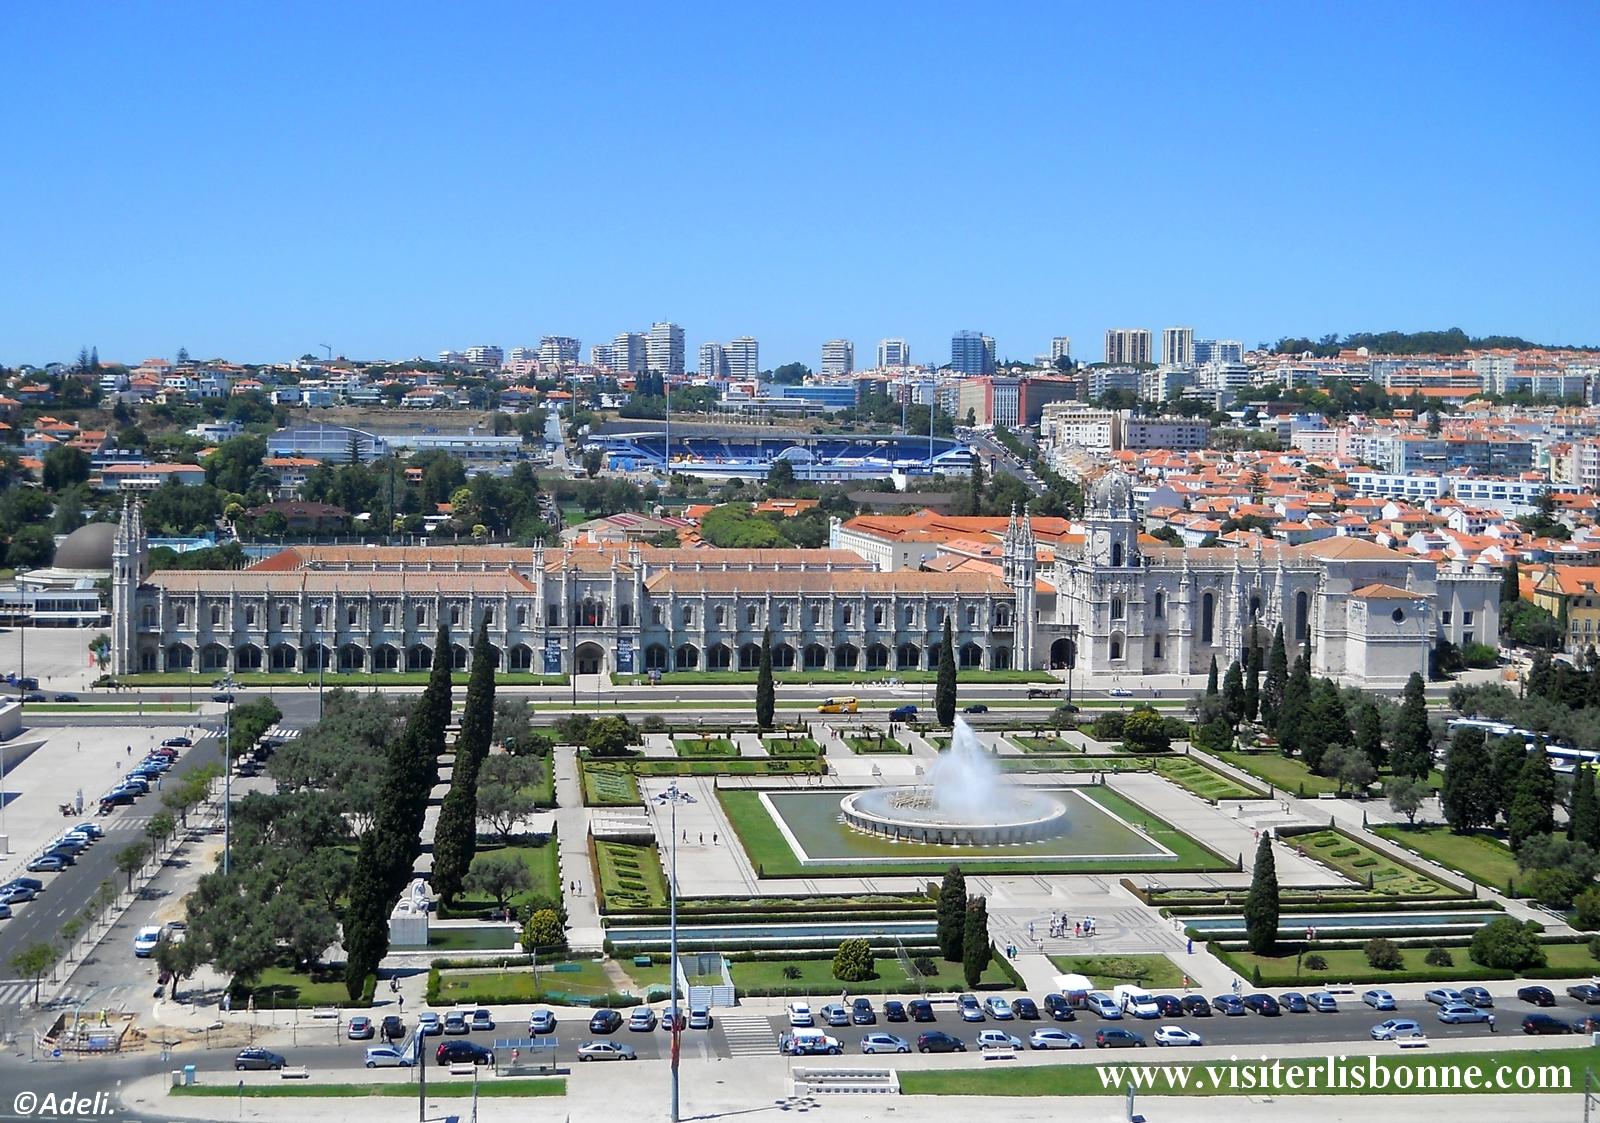 Mosteiro dos Jerónimos - Monastère des Hiéronymites - Lisbonne